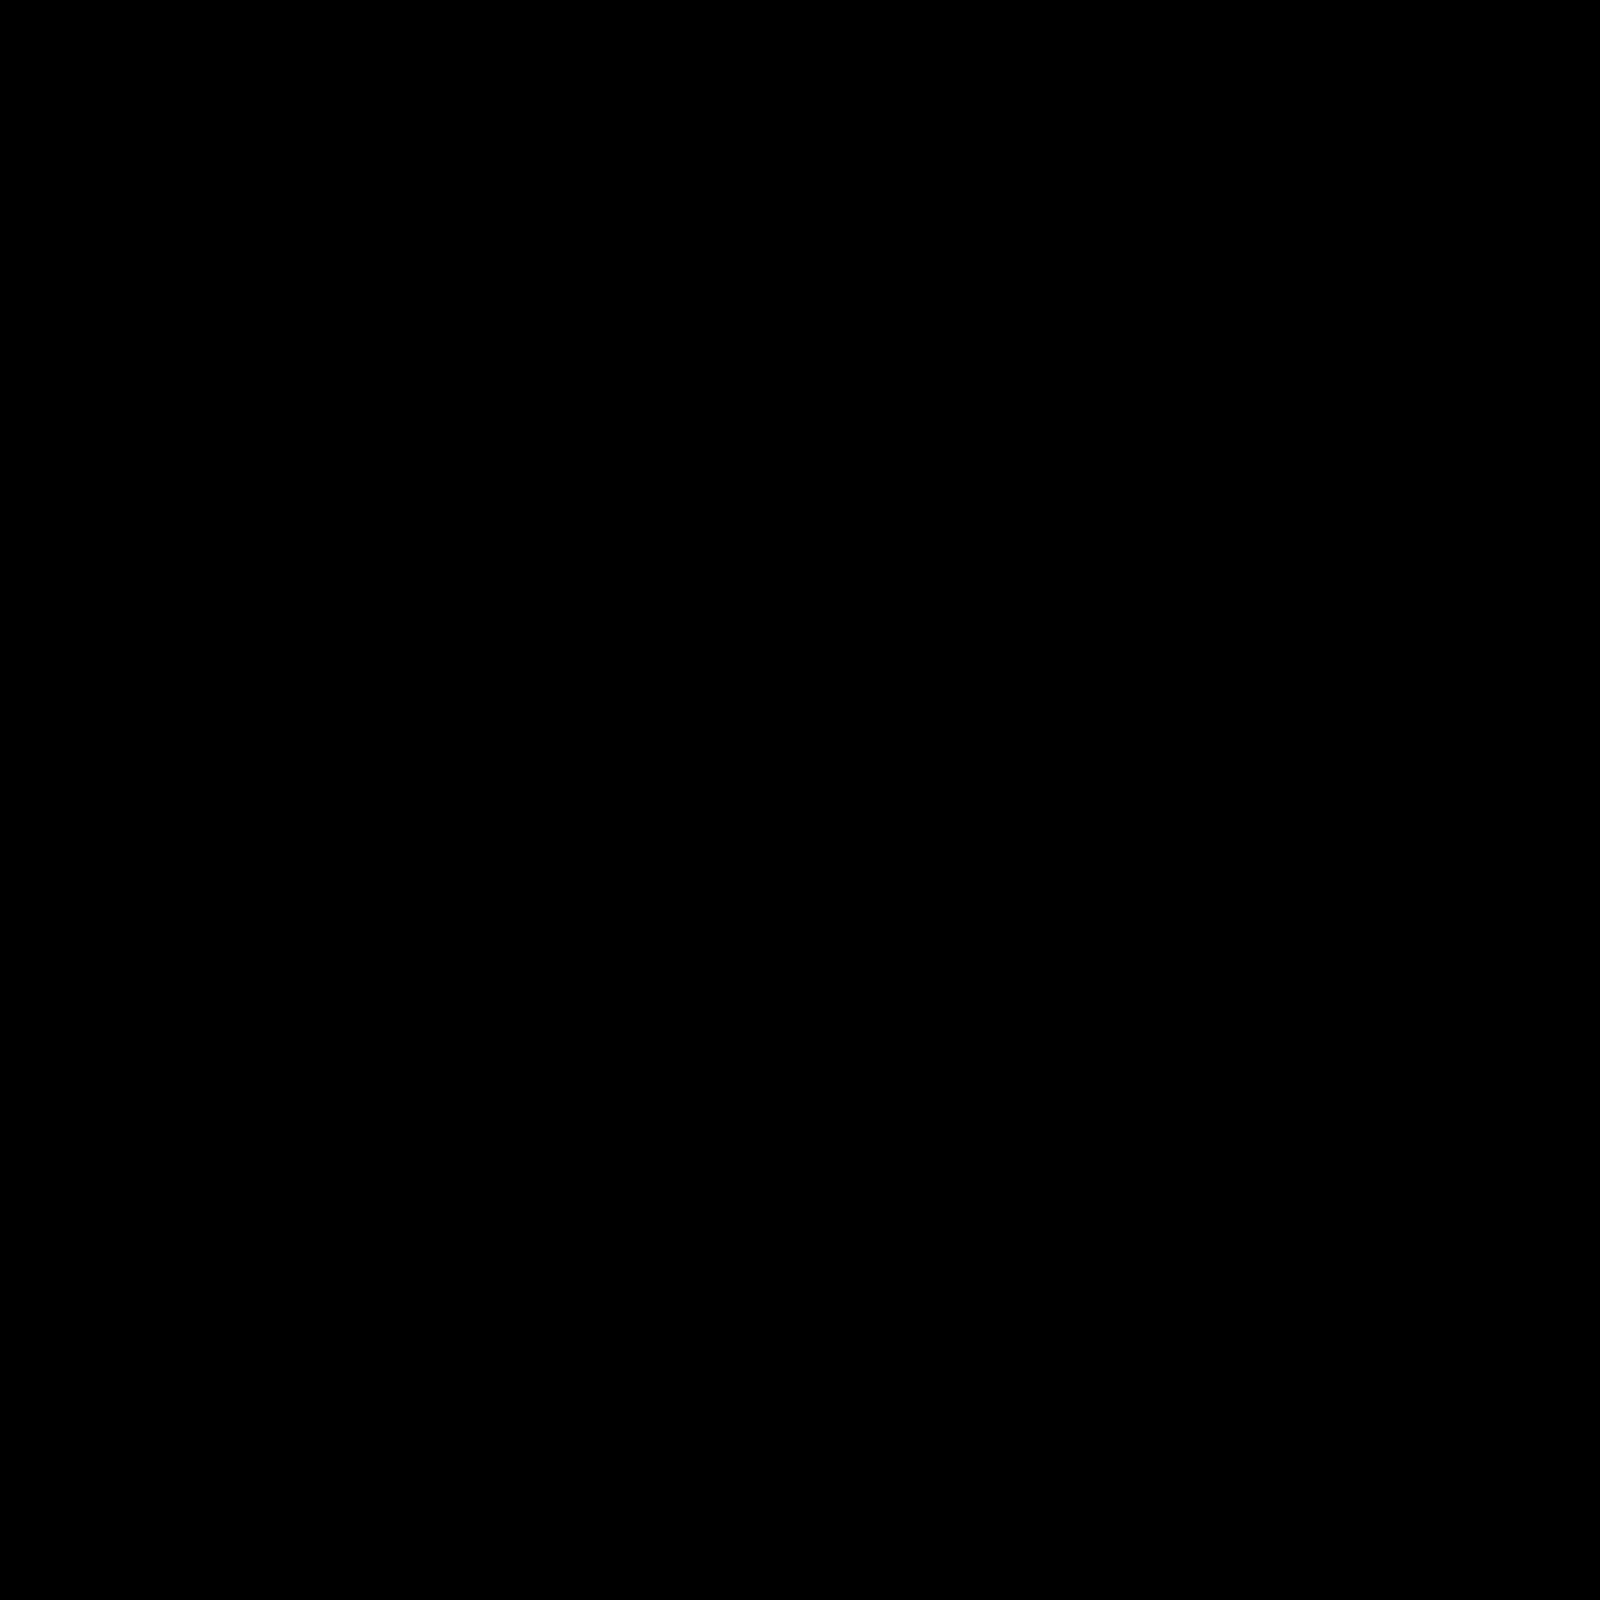 Bull Horns Vector